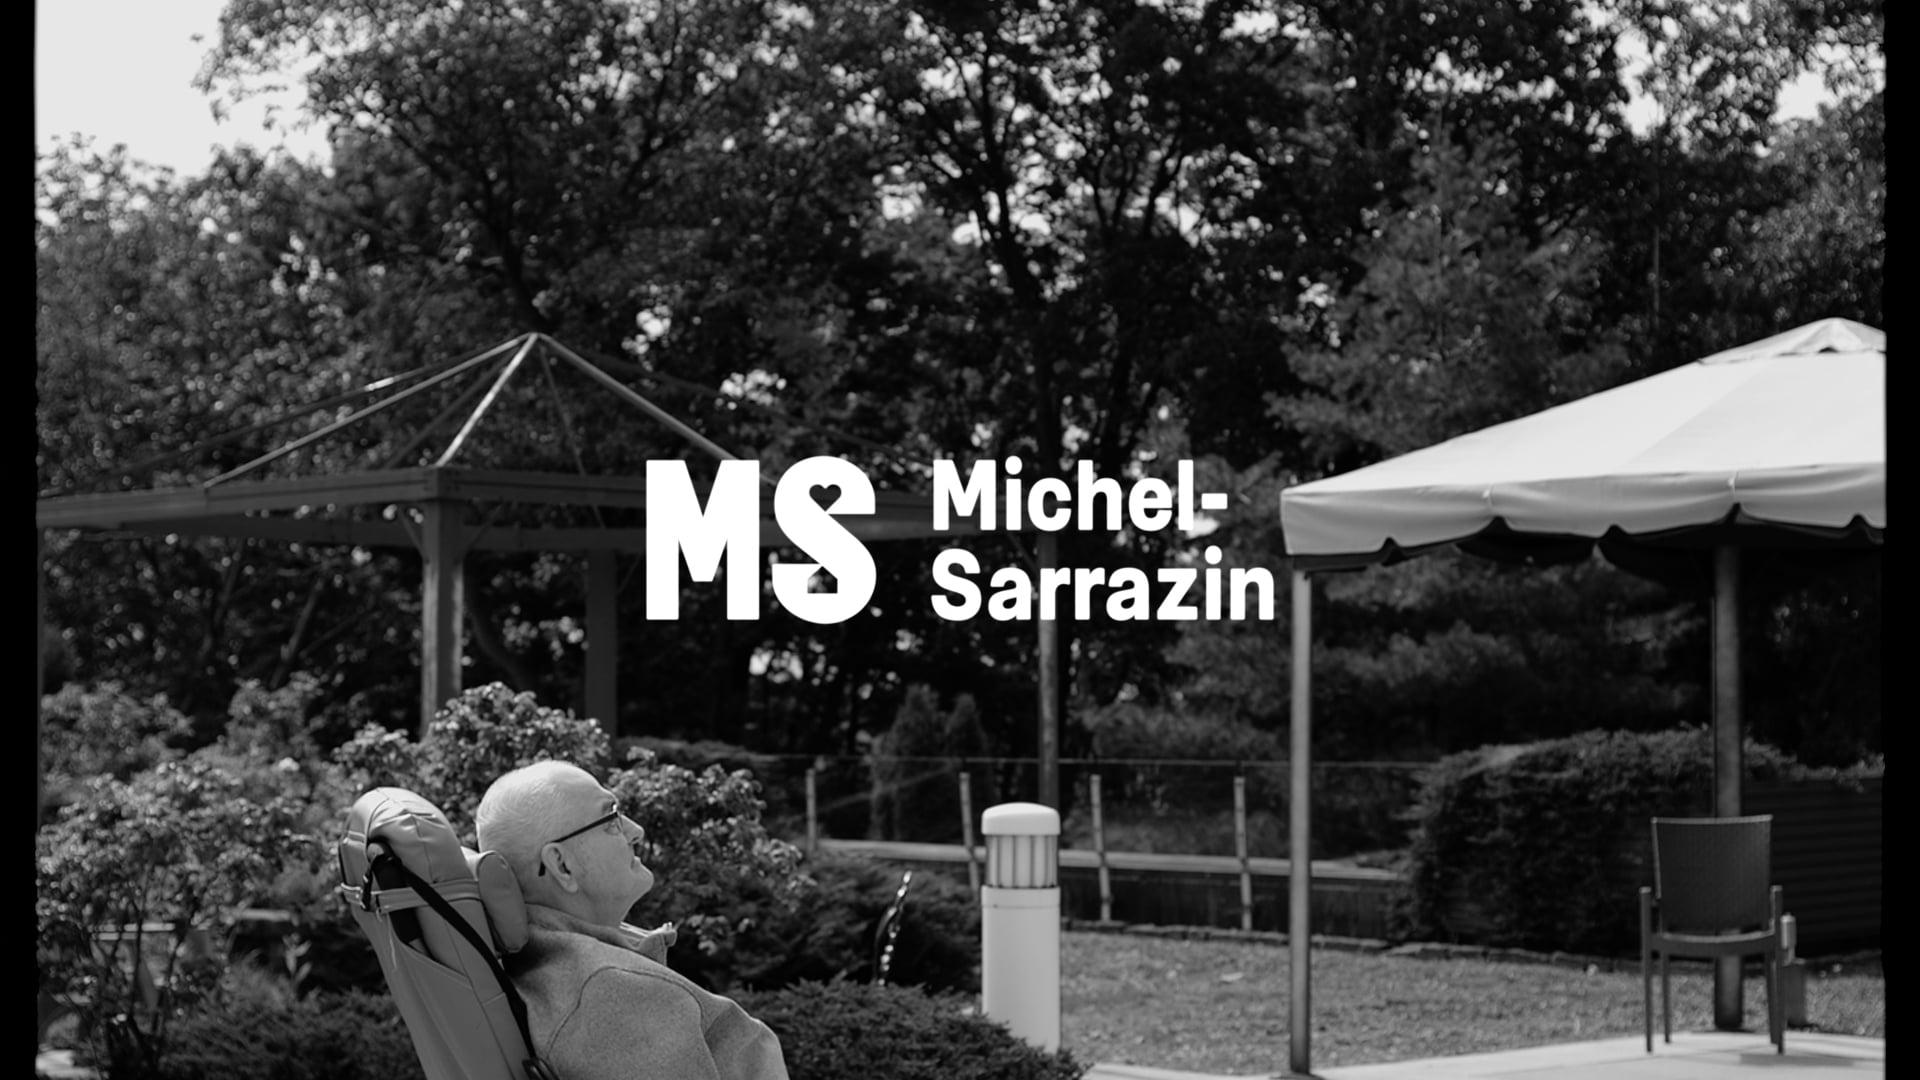 Michel-Sarrazin